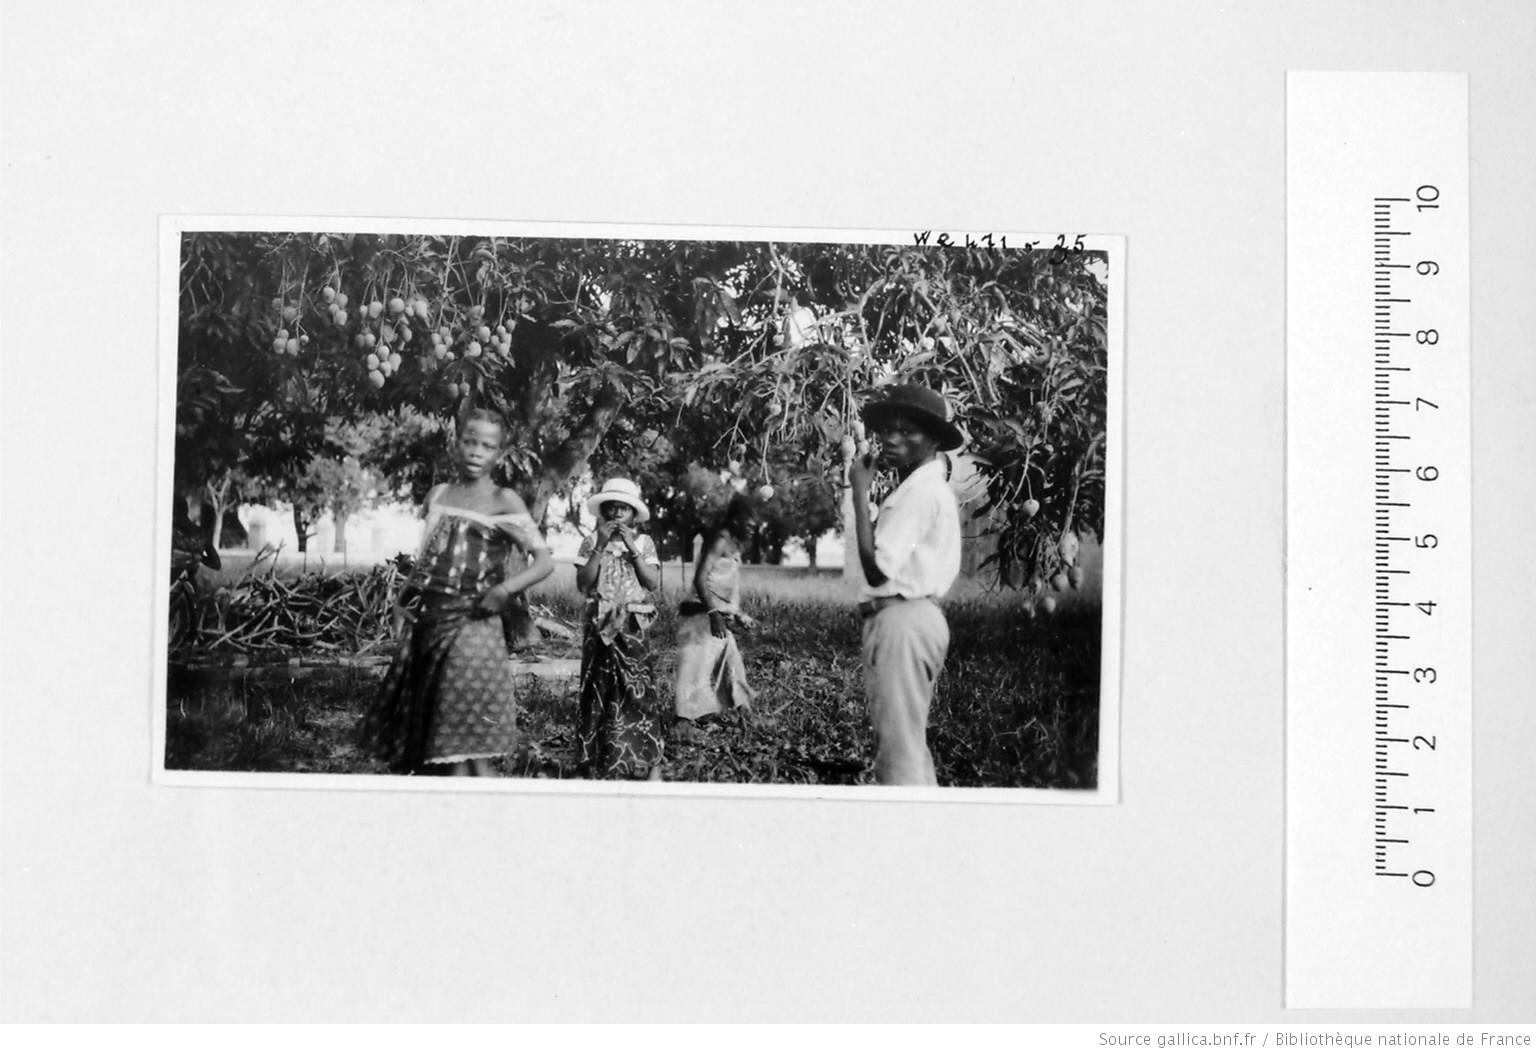 [39 phot. d'A.E.F. en 1924. Enregistré en 1936] - 33